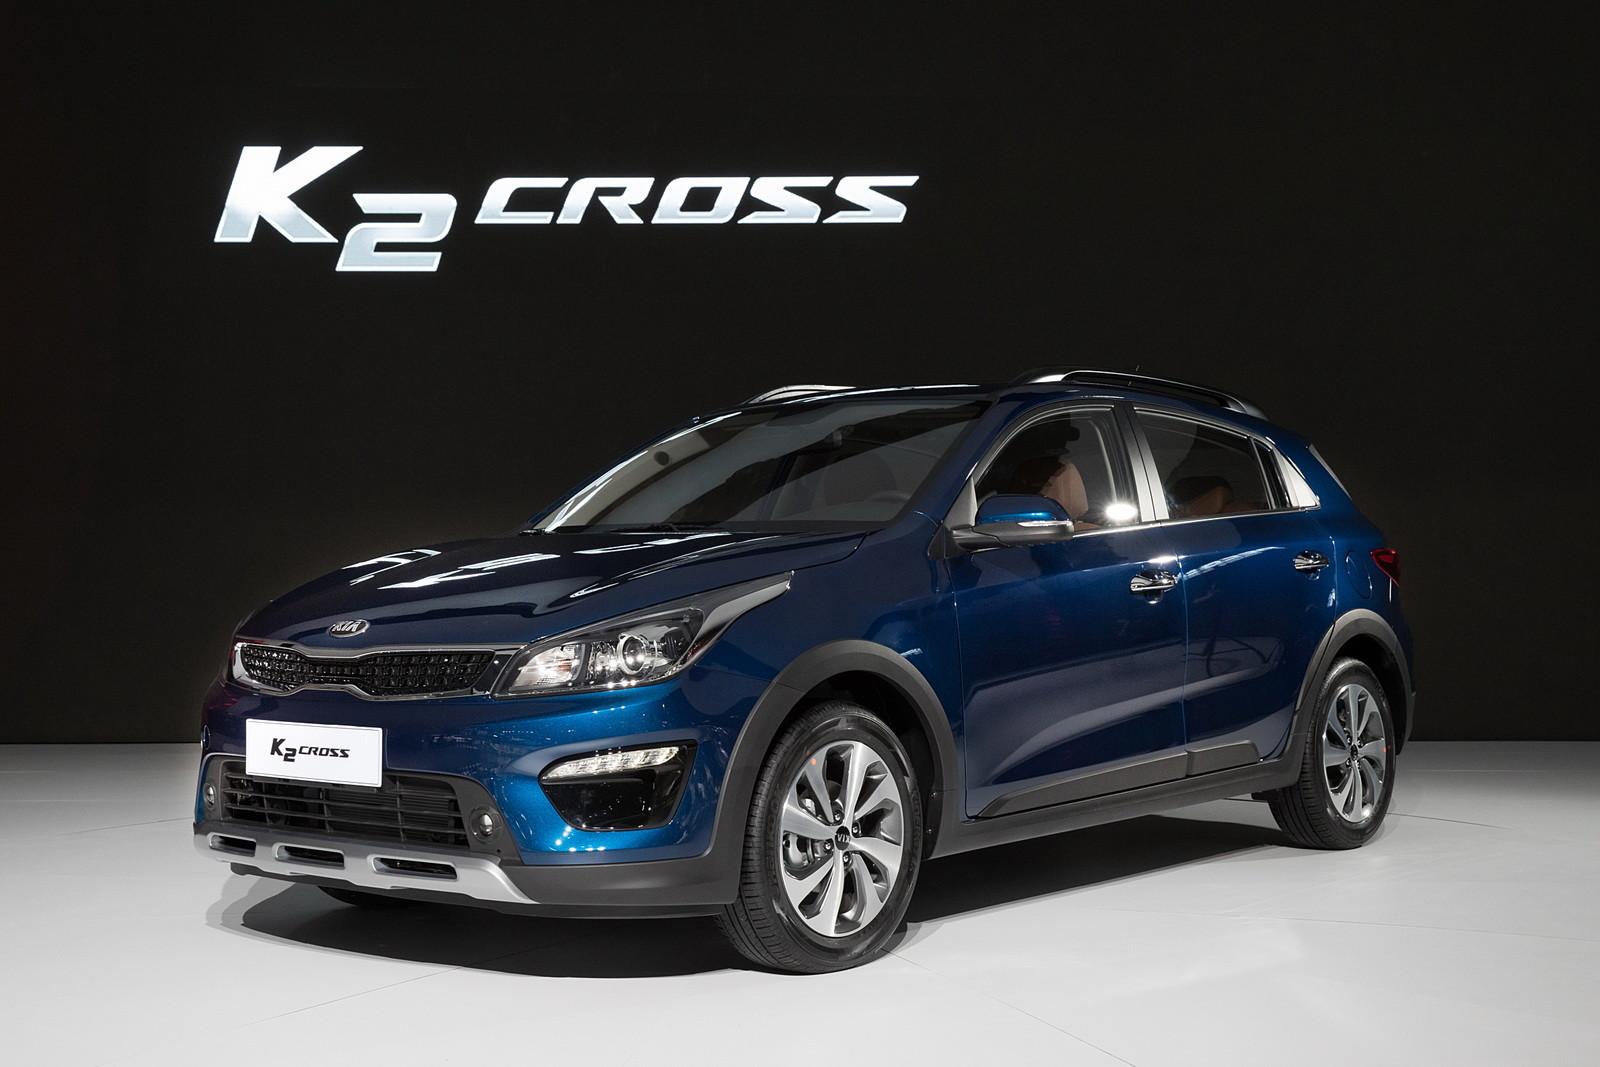 India Bound Kia Motors Reveal Pegas Compact Sedan And K2 Cross For